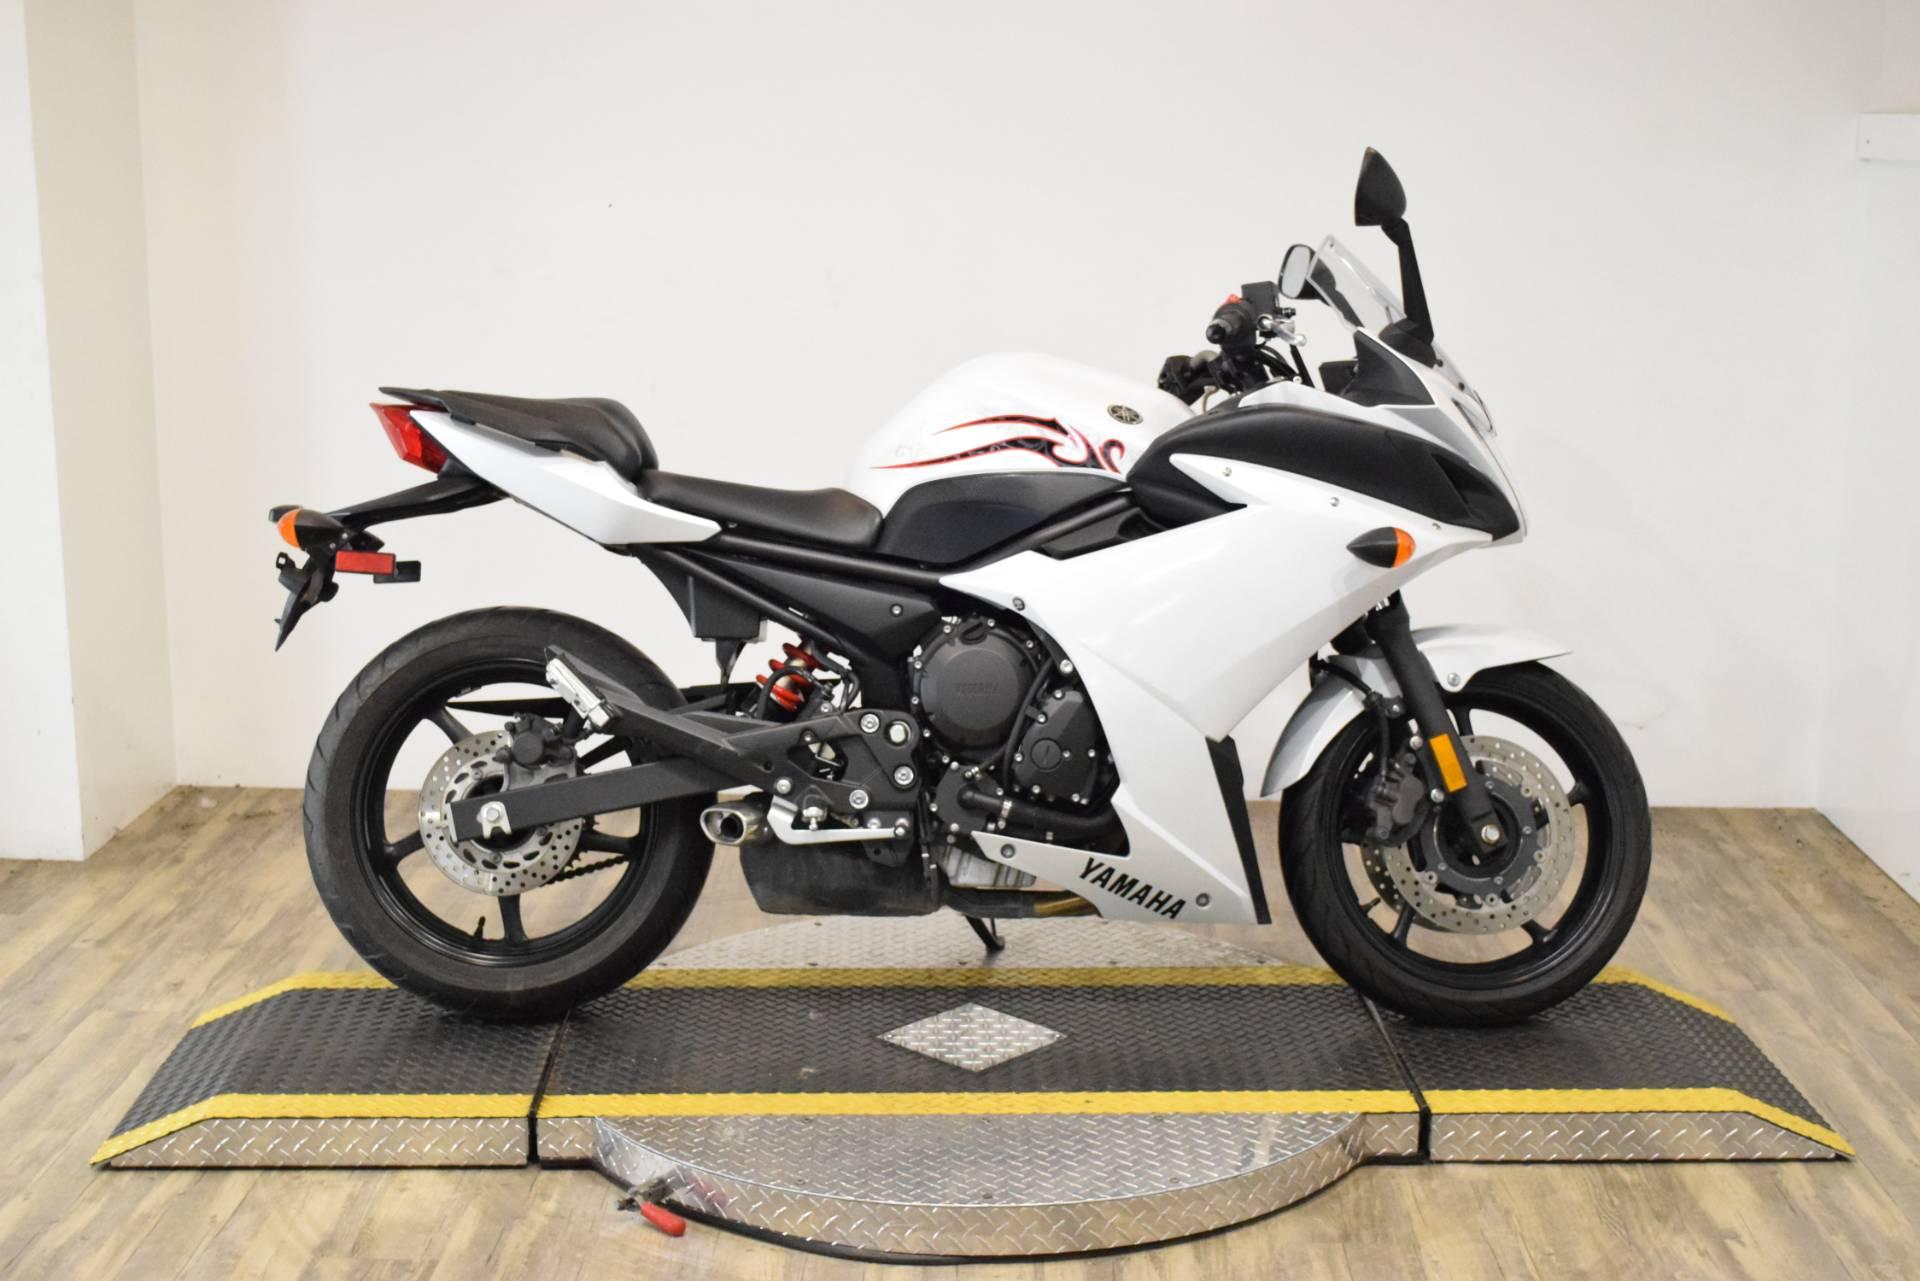 2009 Yamaha FZ6R Used Motorcycle for Sale Wauconda Illinois